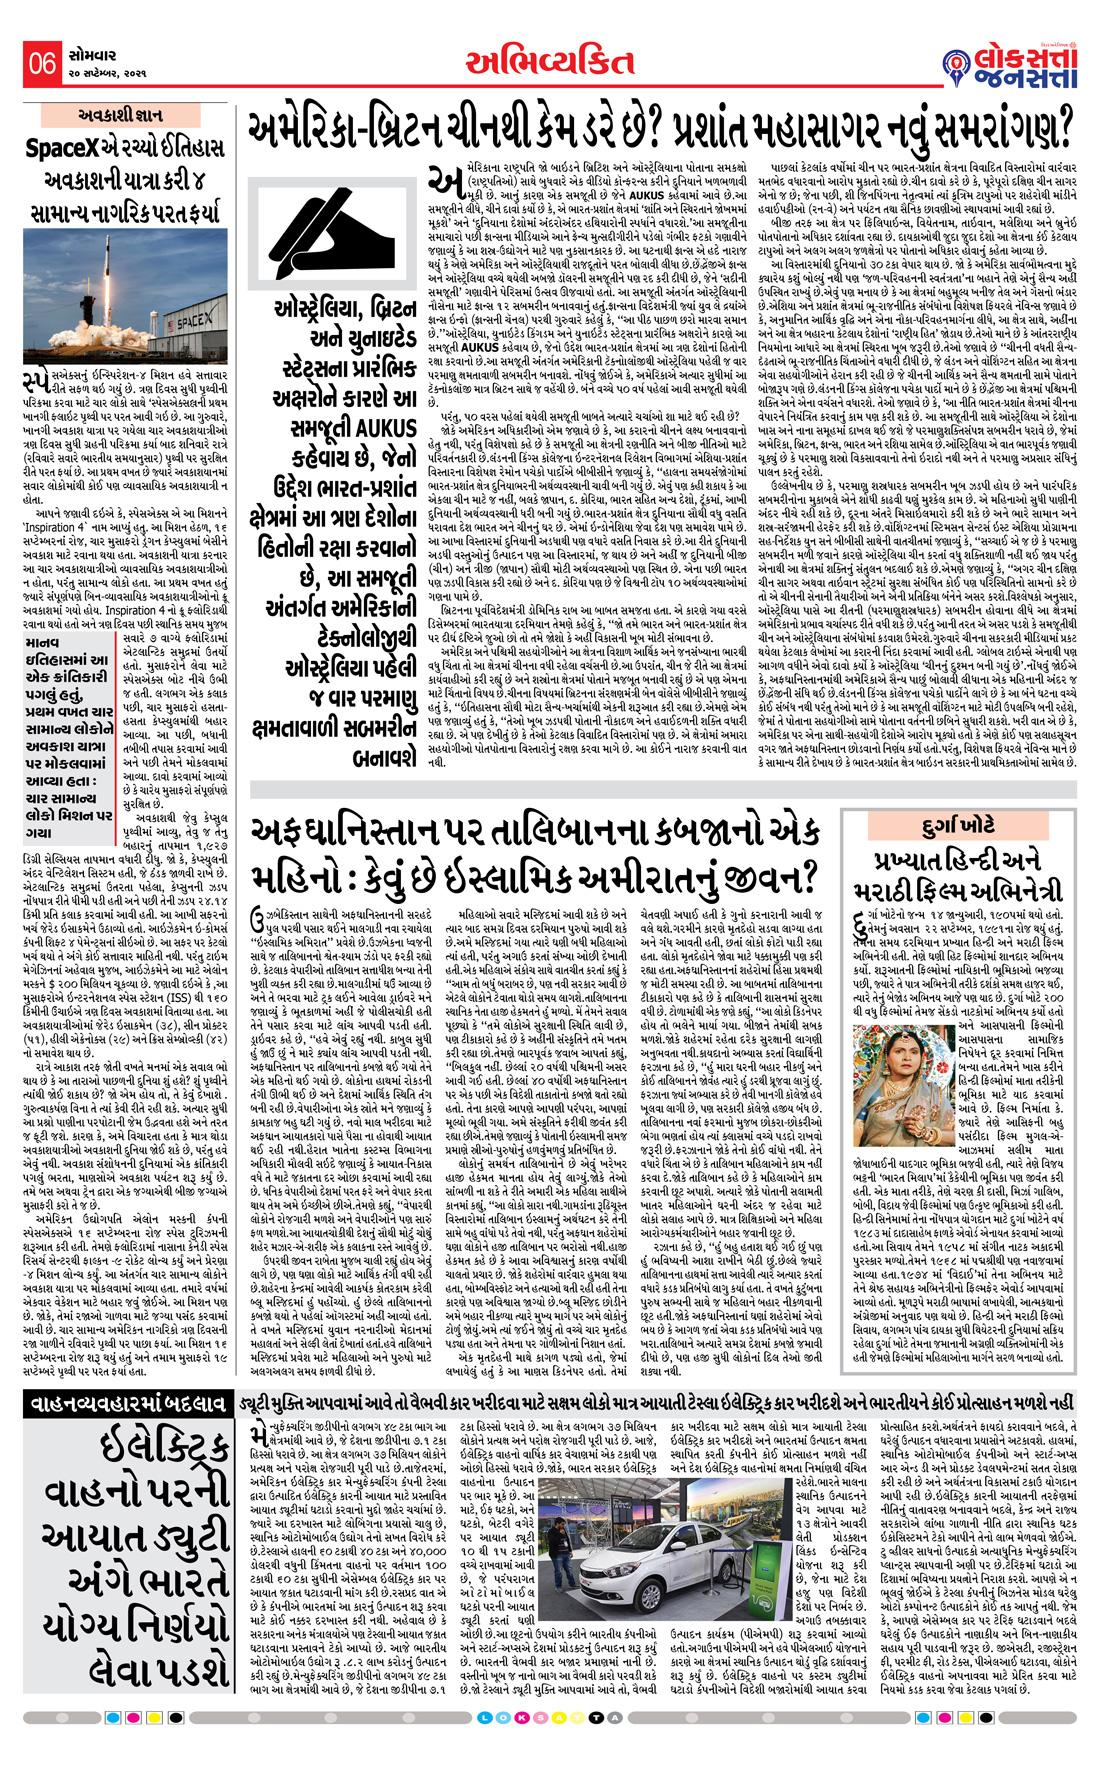 Loksatta Jansatta News Papaer E-paper dated 2021-09-20 | Page 6